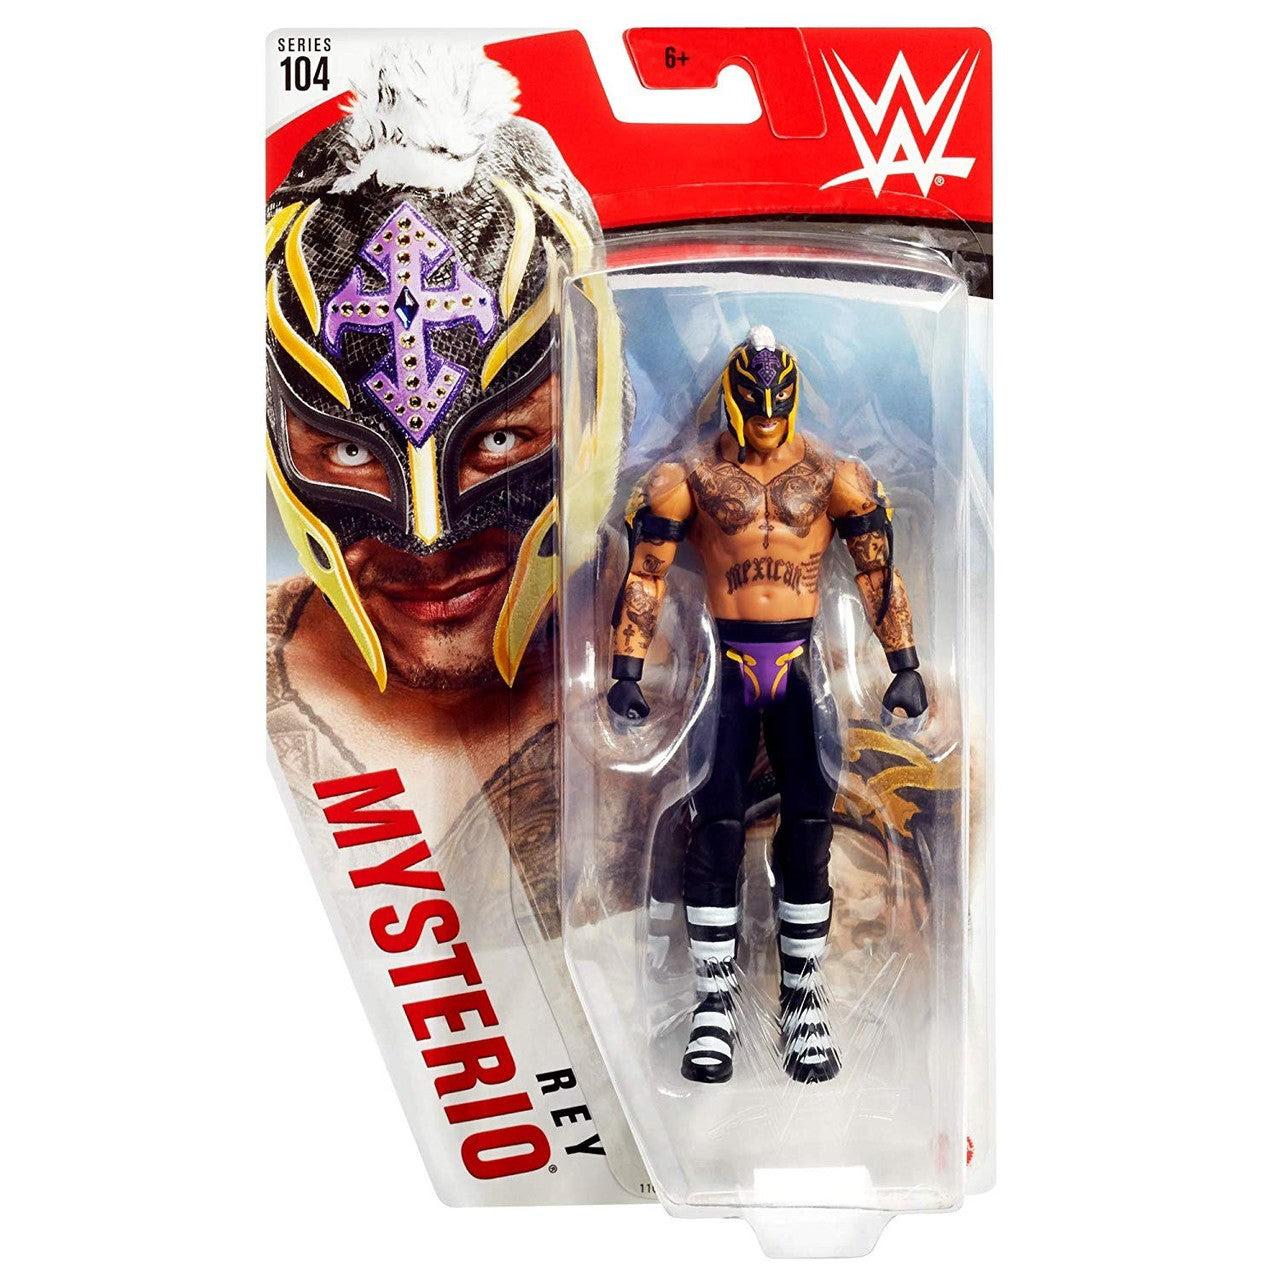 Image of WWE Basic Figure Series 104 - Rey Mysterio